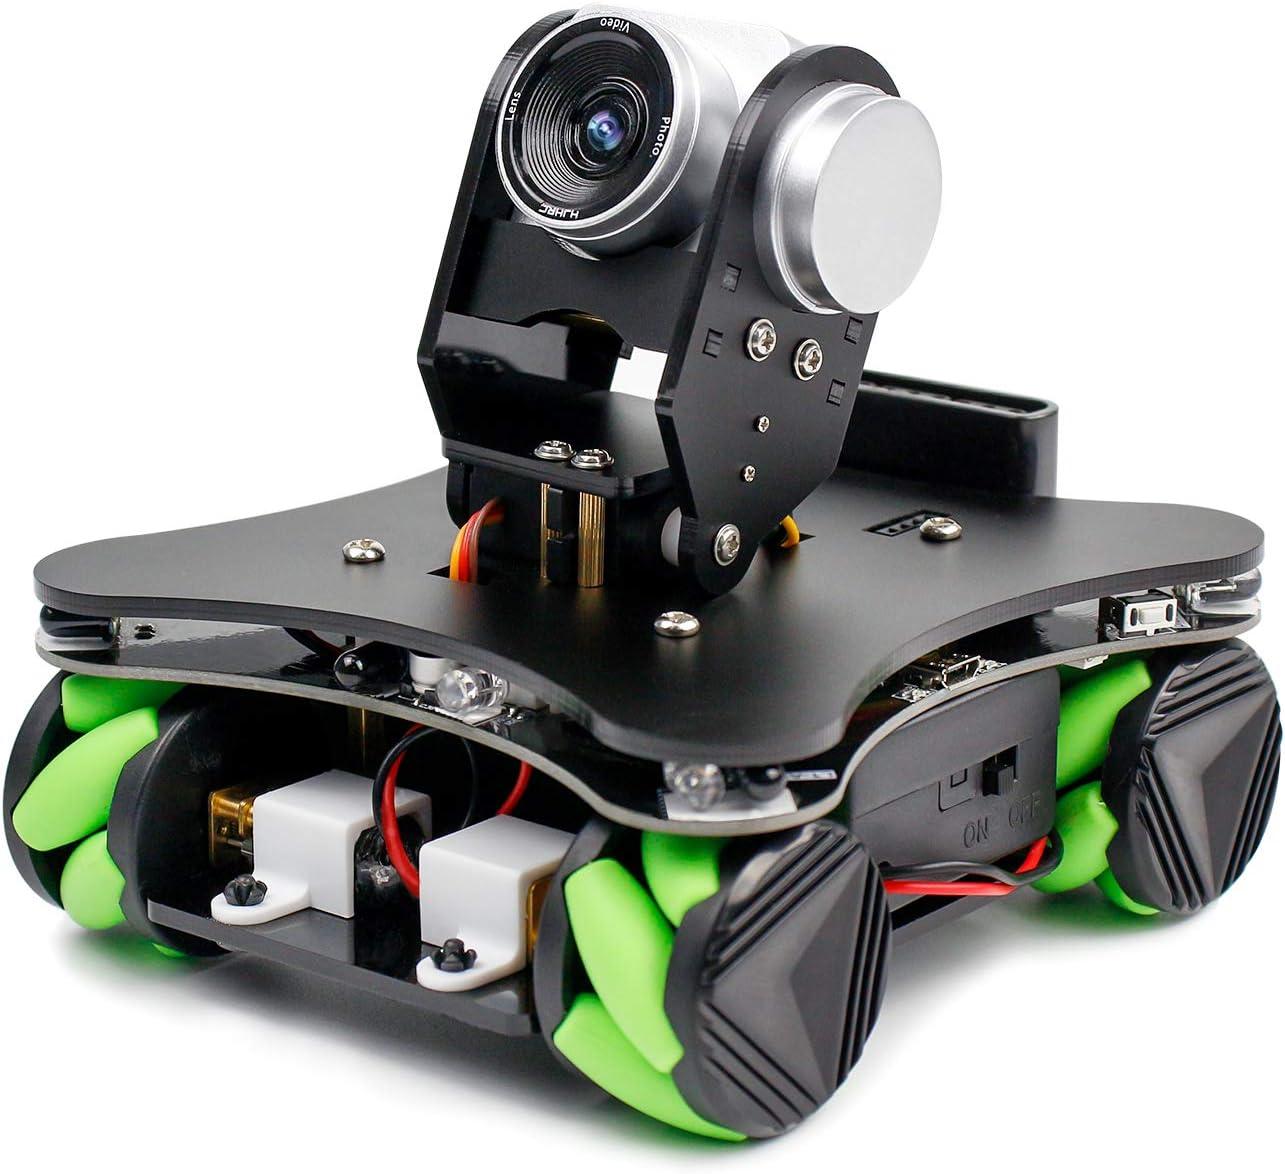 Yahboom Coding Mecanum Wheel Smart Robot Kit Whit FPV Camera, DIY Omnidirectional Car for UNO R3